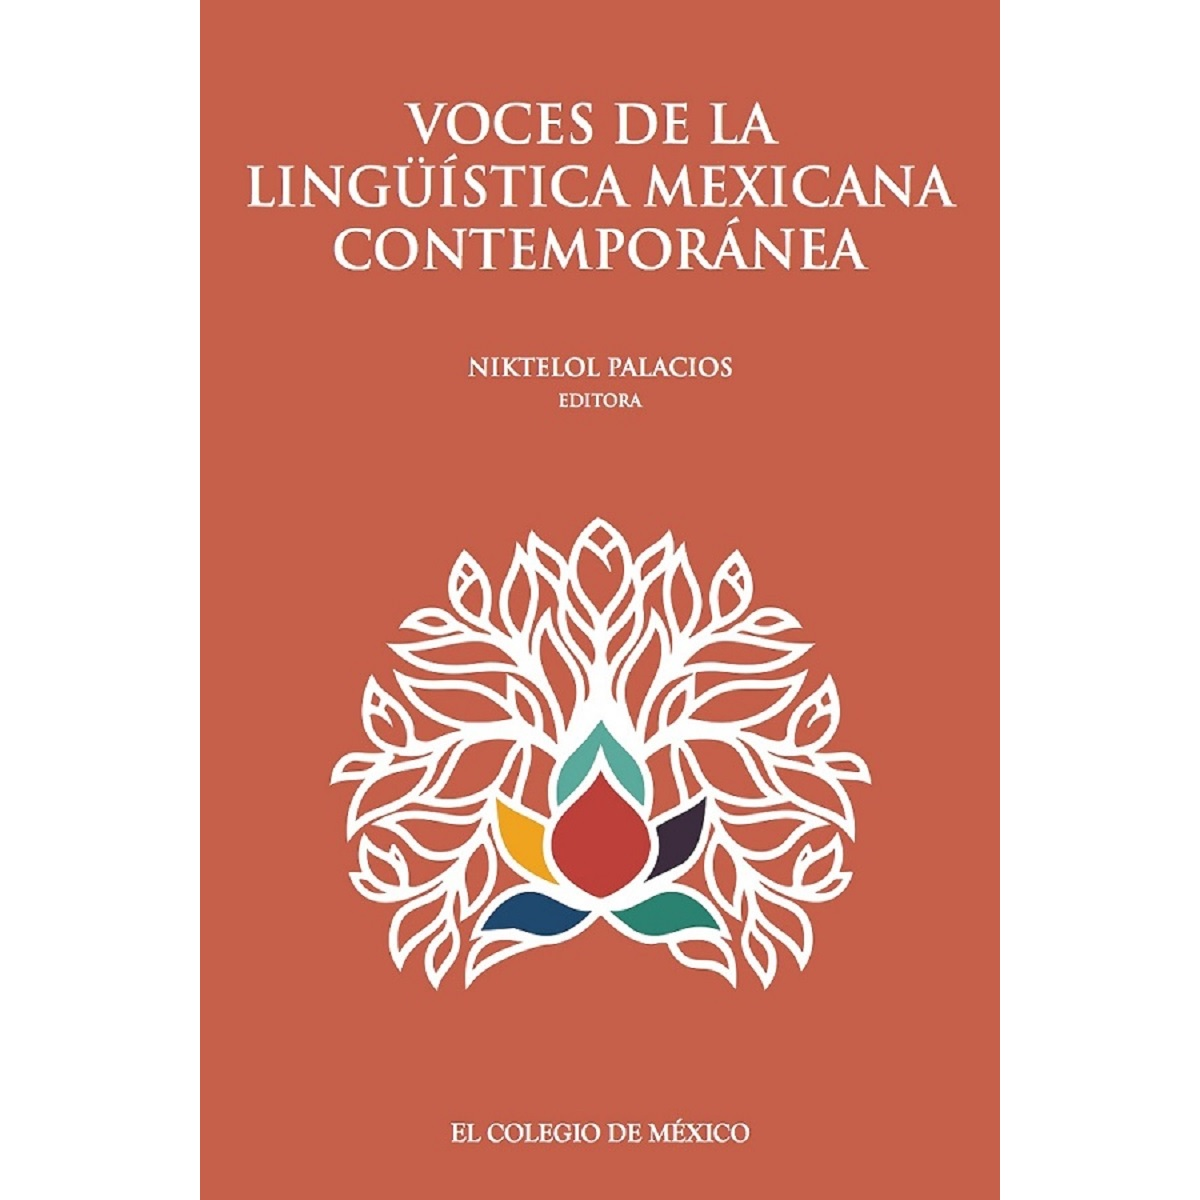 Voces de la lingüística mexicana contemporánea